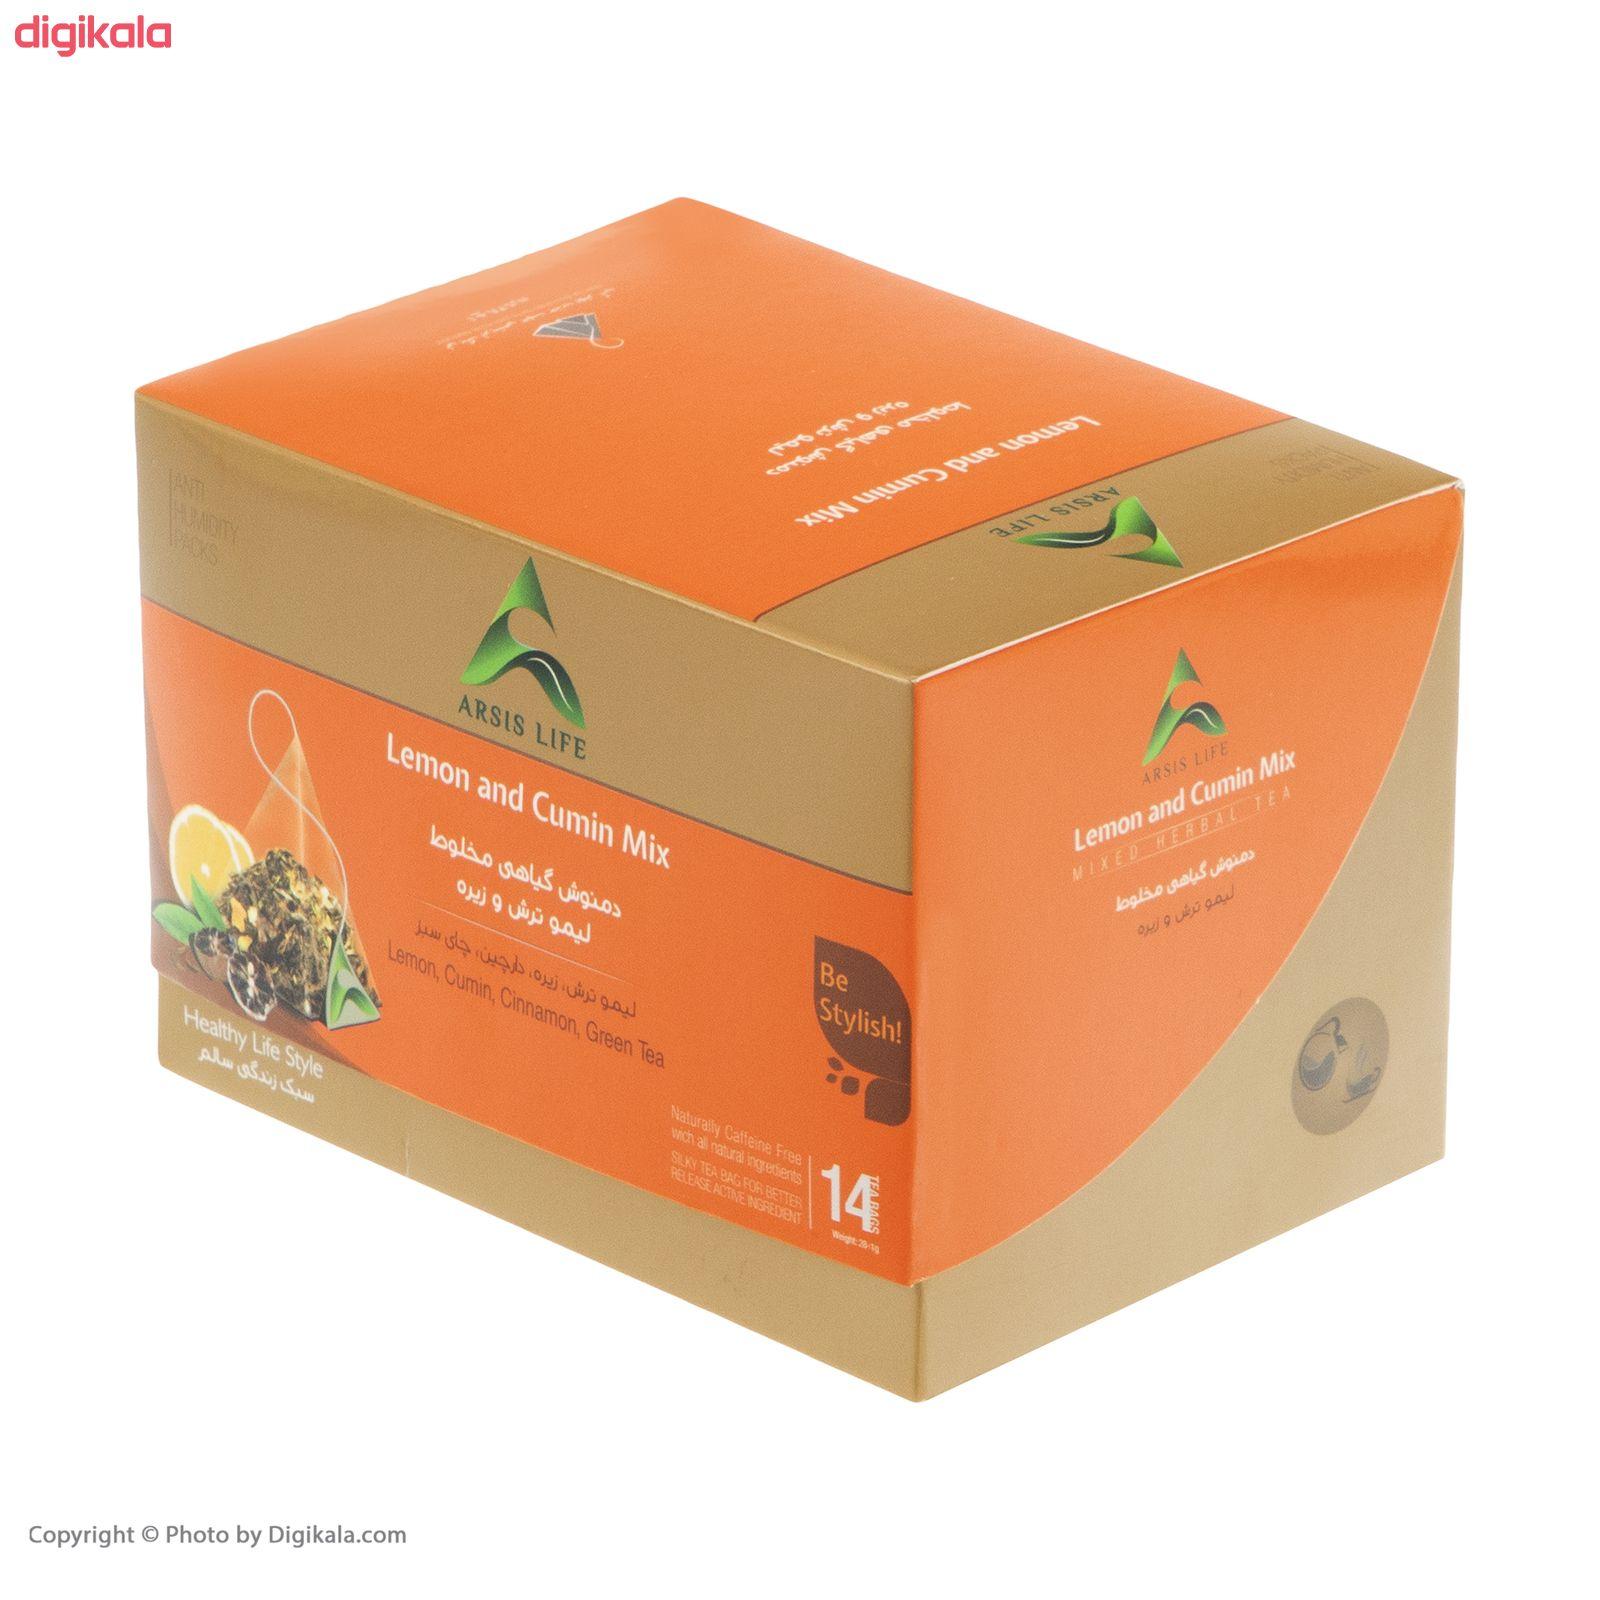 دمنوش گیاهی مخلوط آرسیس با طعم لیمو ترش و زیره - بسته 14 عددی main 1 1